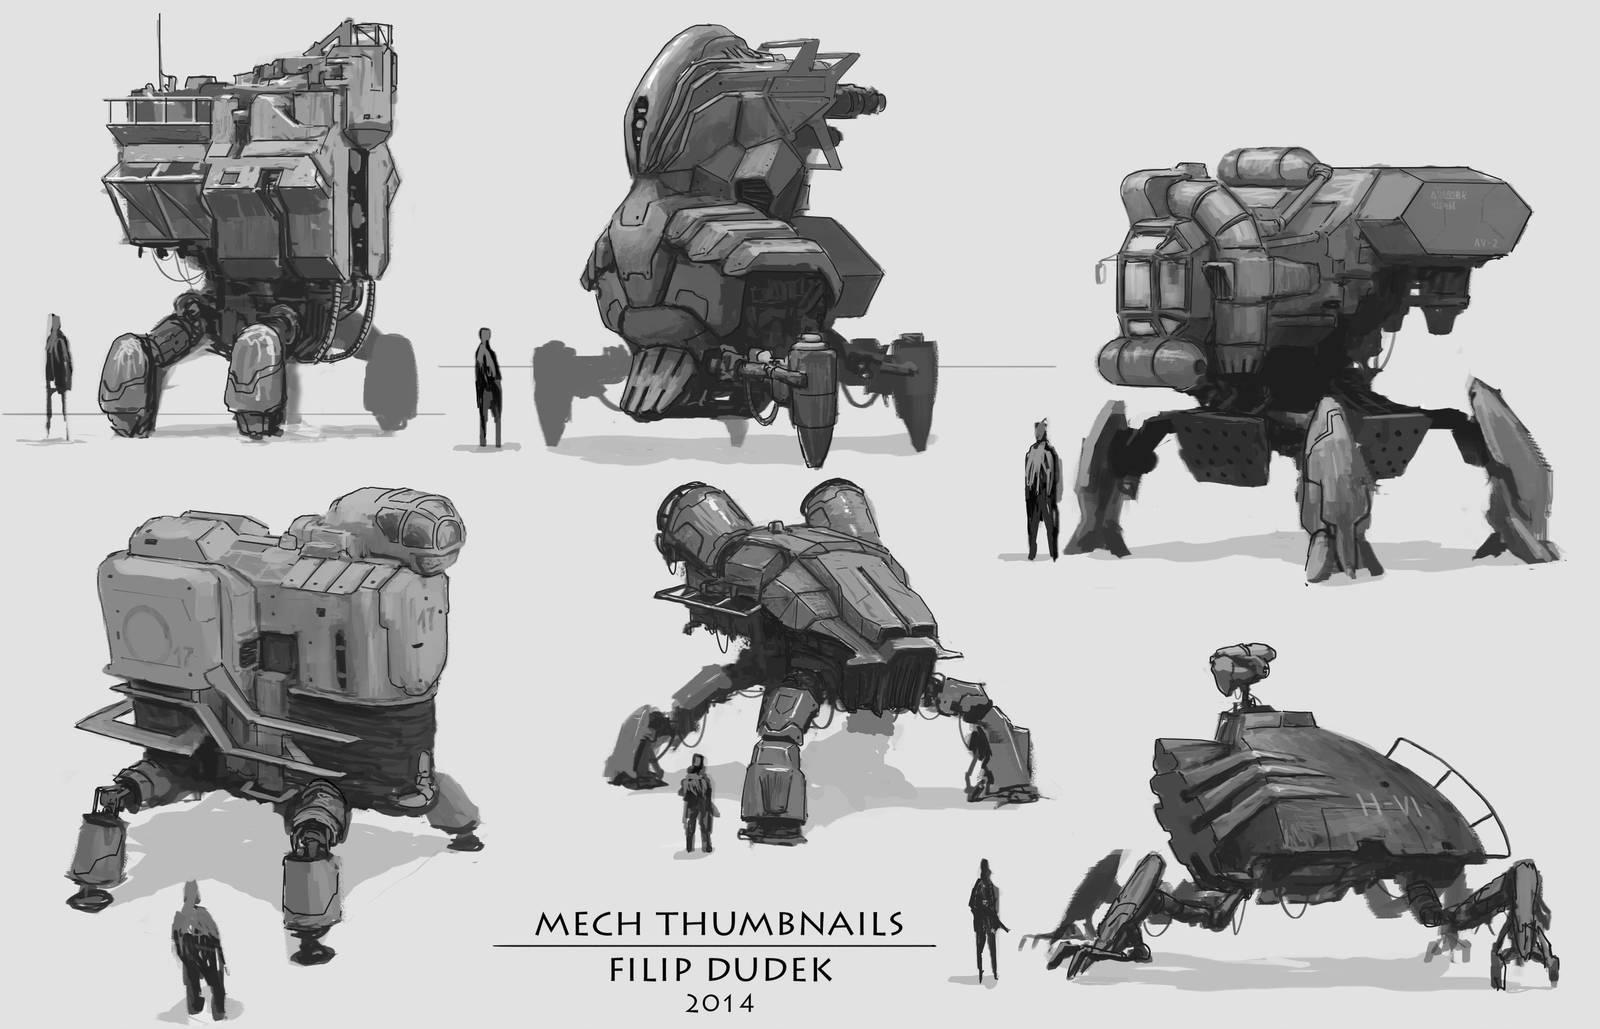 mech thumbnail by 5ofnovember